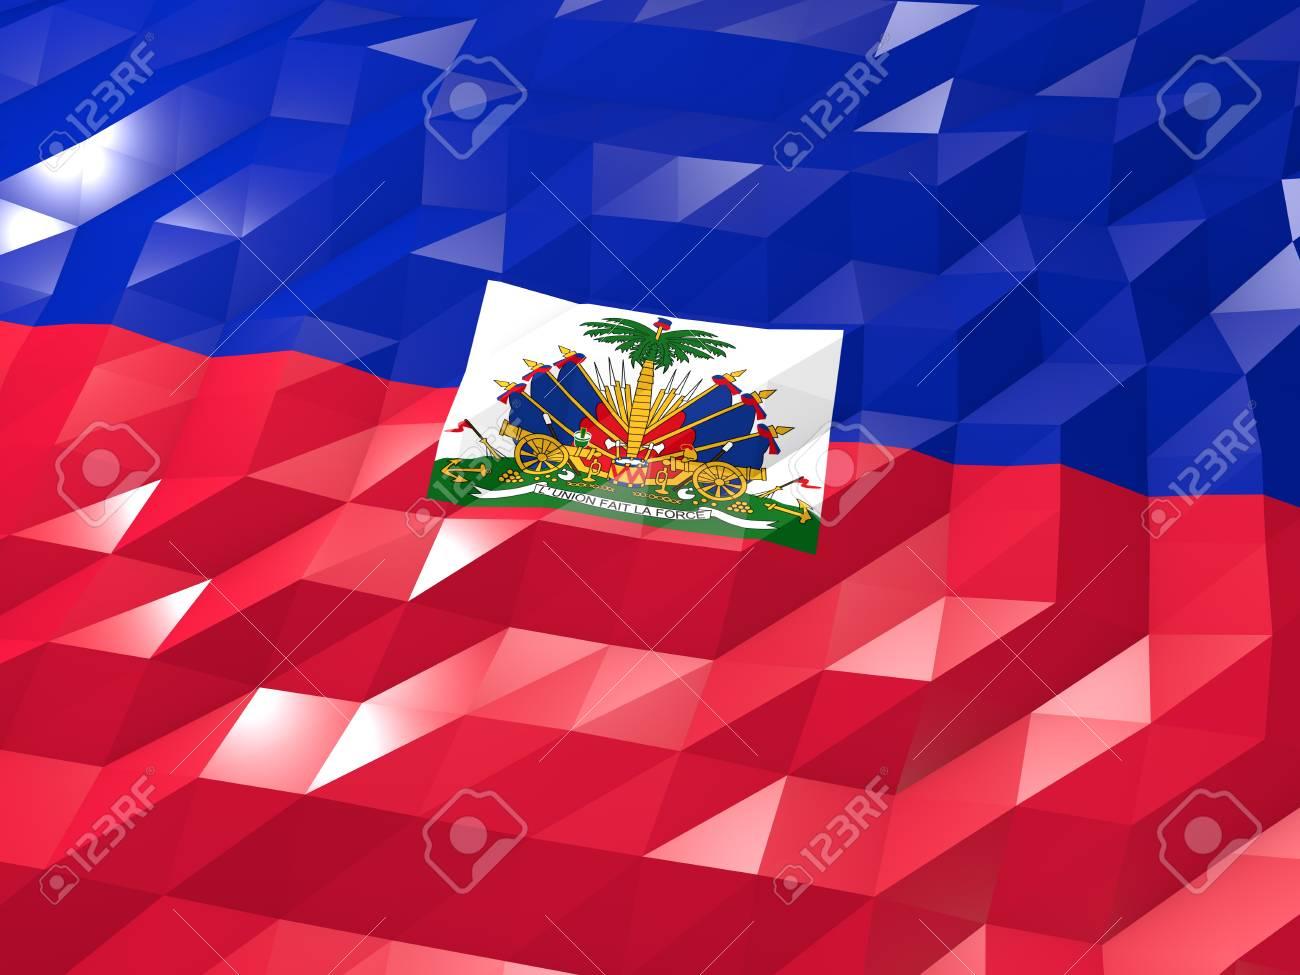 Flag Of Haiti 3D Wallpaper Illustration National Symbol Low Polygonal Glossy Origami Style Stock